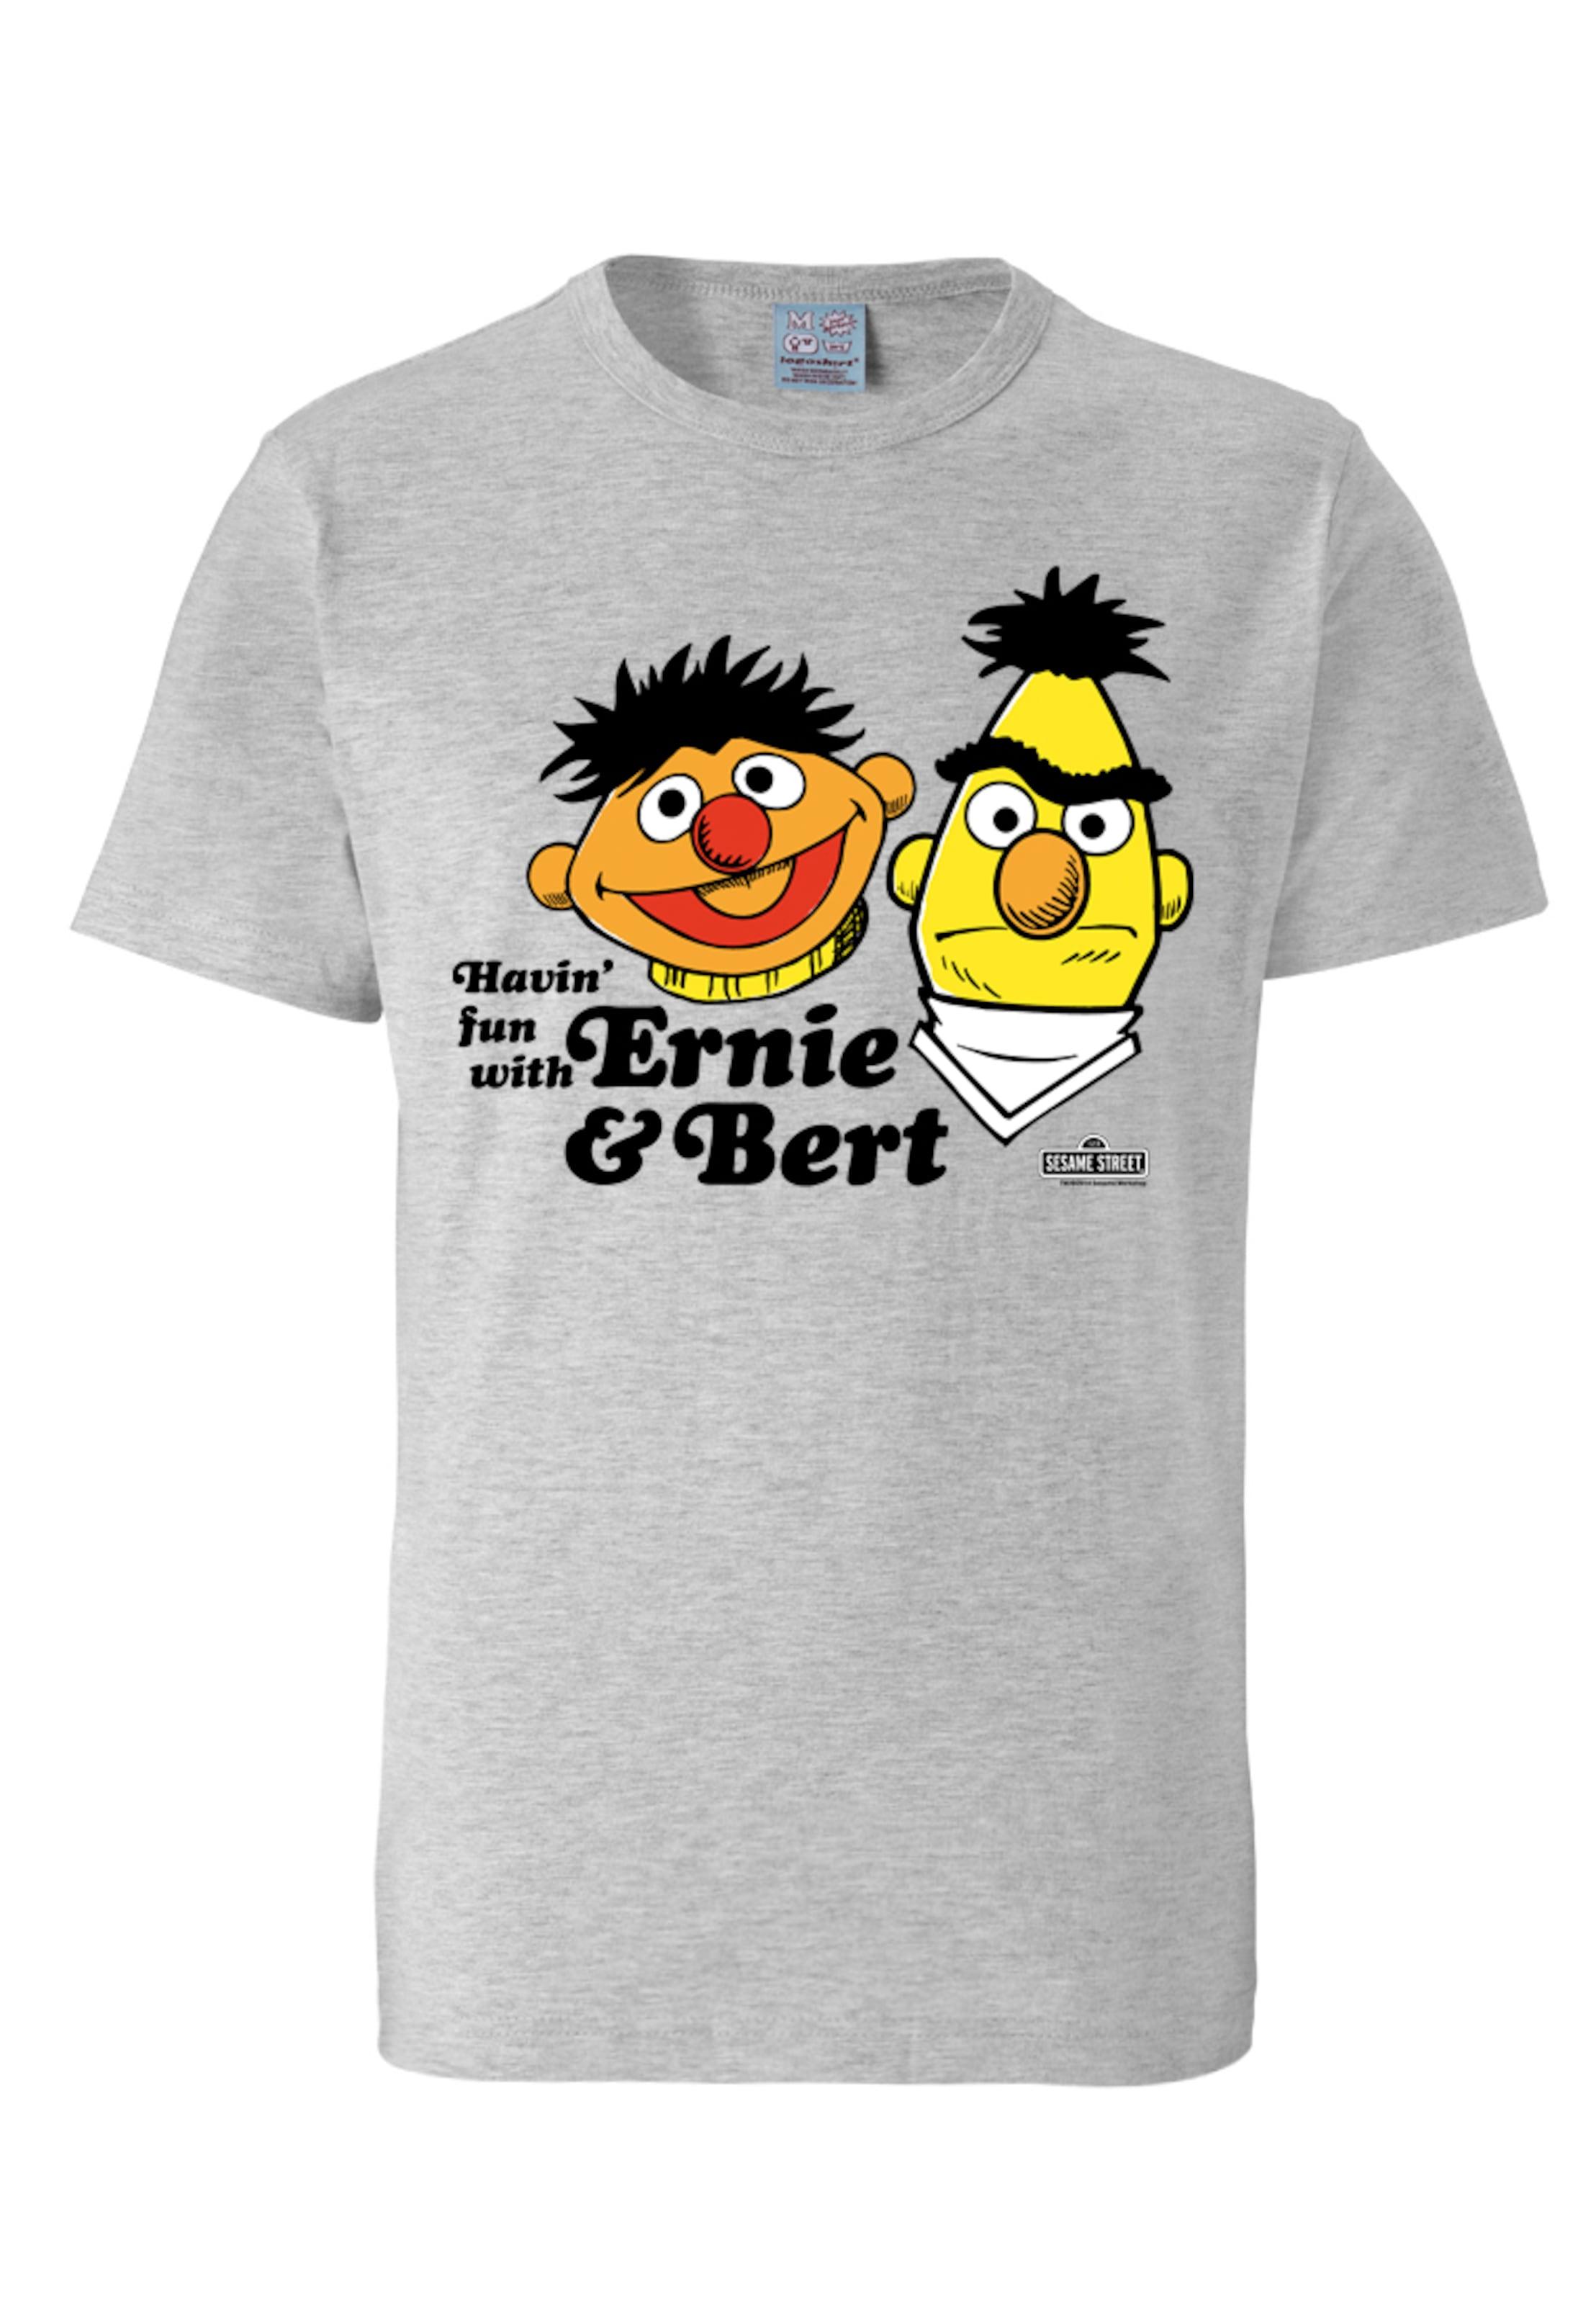 Ernieamp; In BertHavin`fun Grau Sesamstrasse Logoshirt T shirt Nnw0ZX8OPk